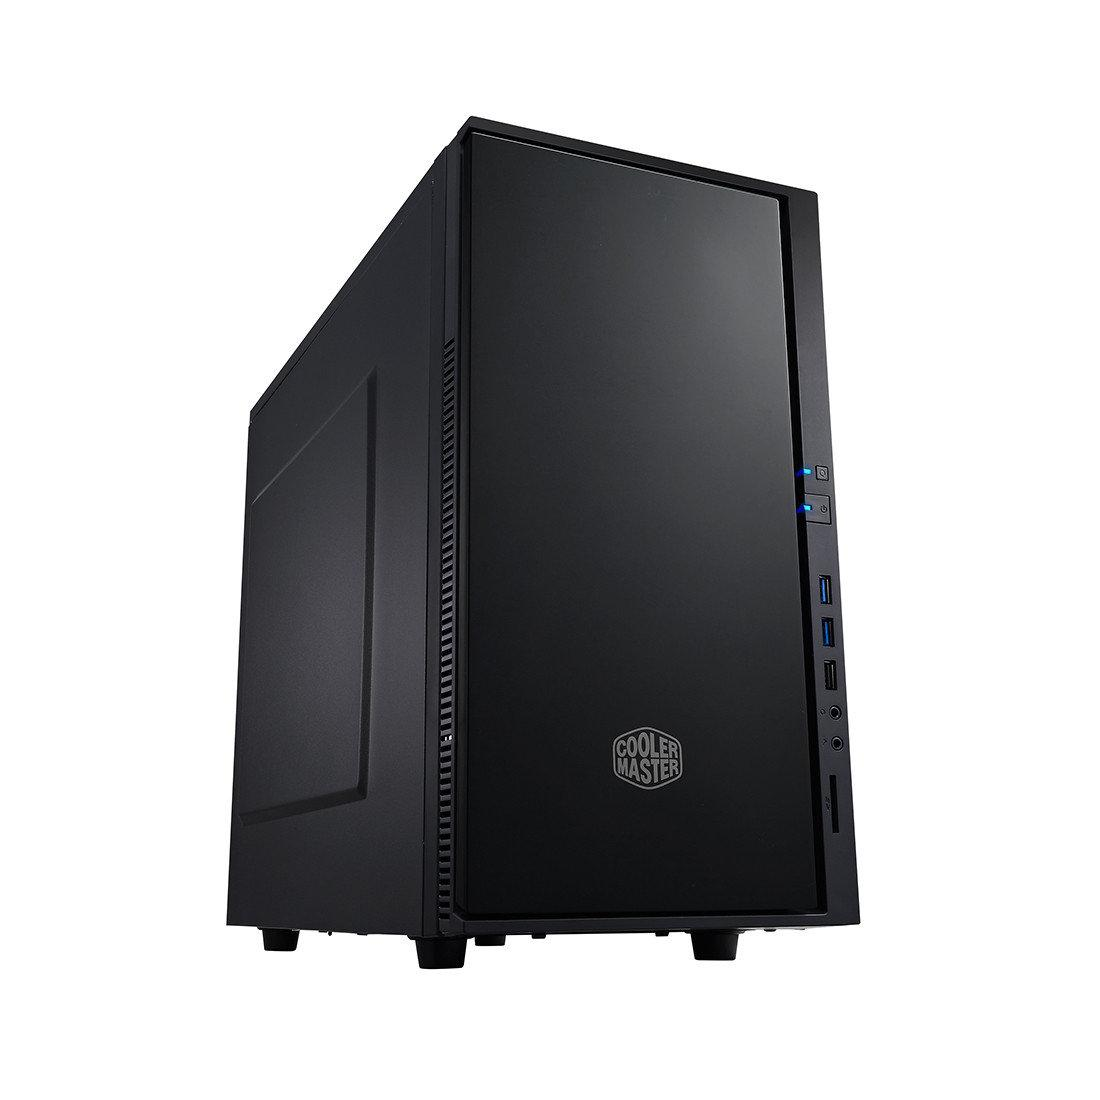 Системный блок Intel Core i3-6100 3.7GHZ/H110/DDR4 4GB/SSD 240GB/450W